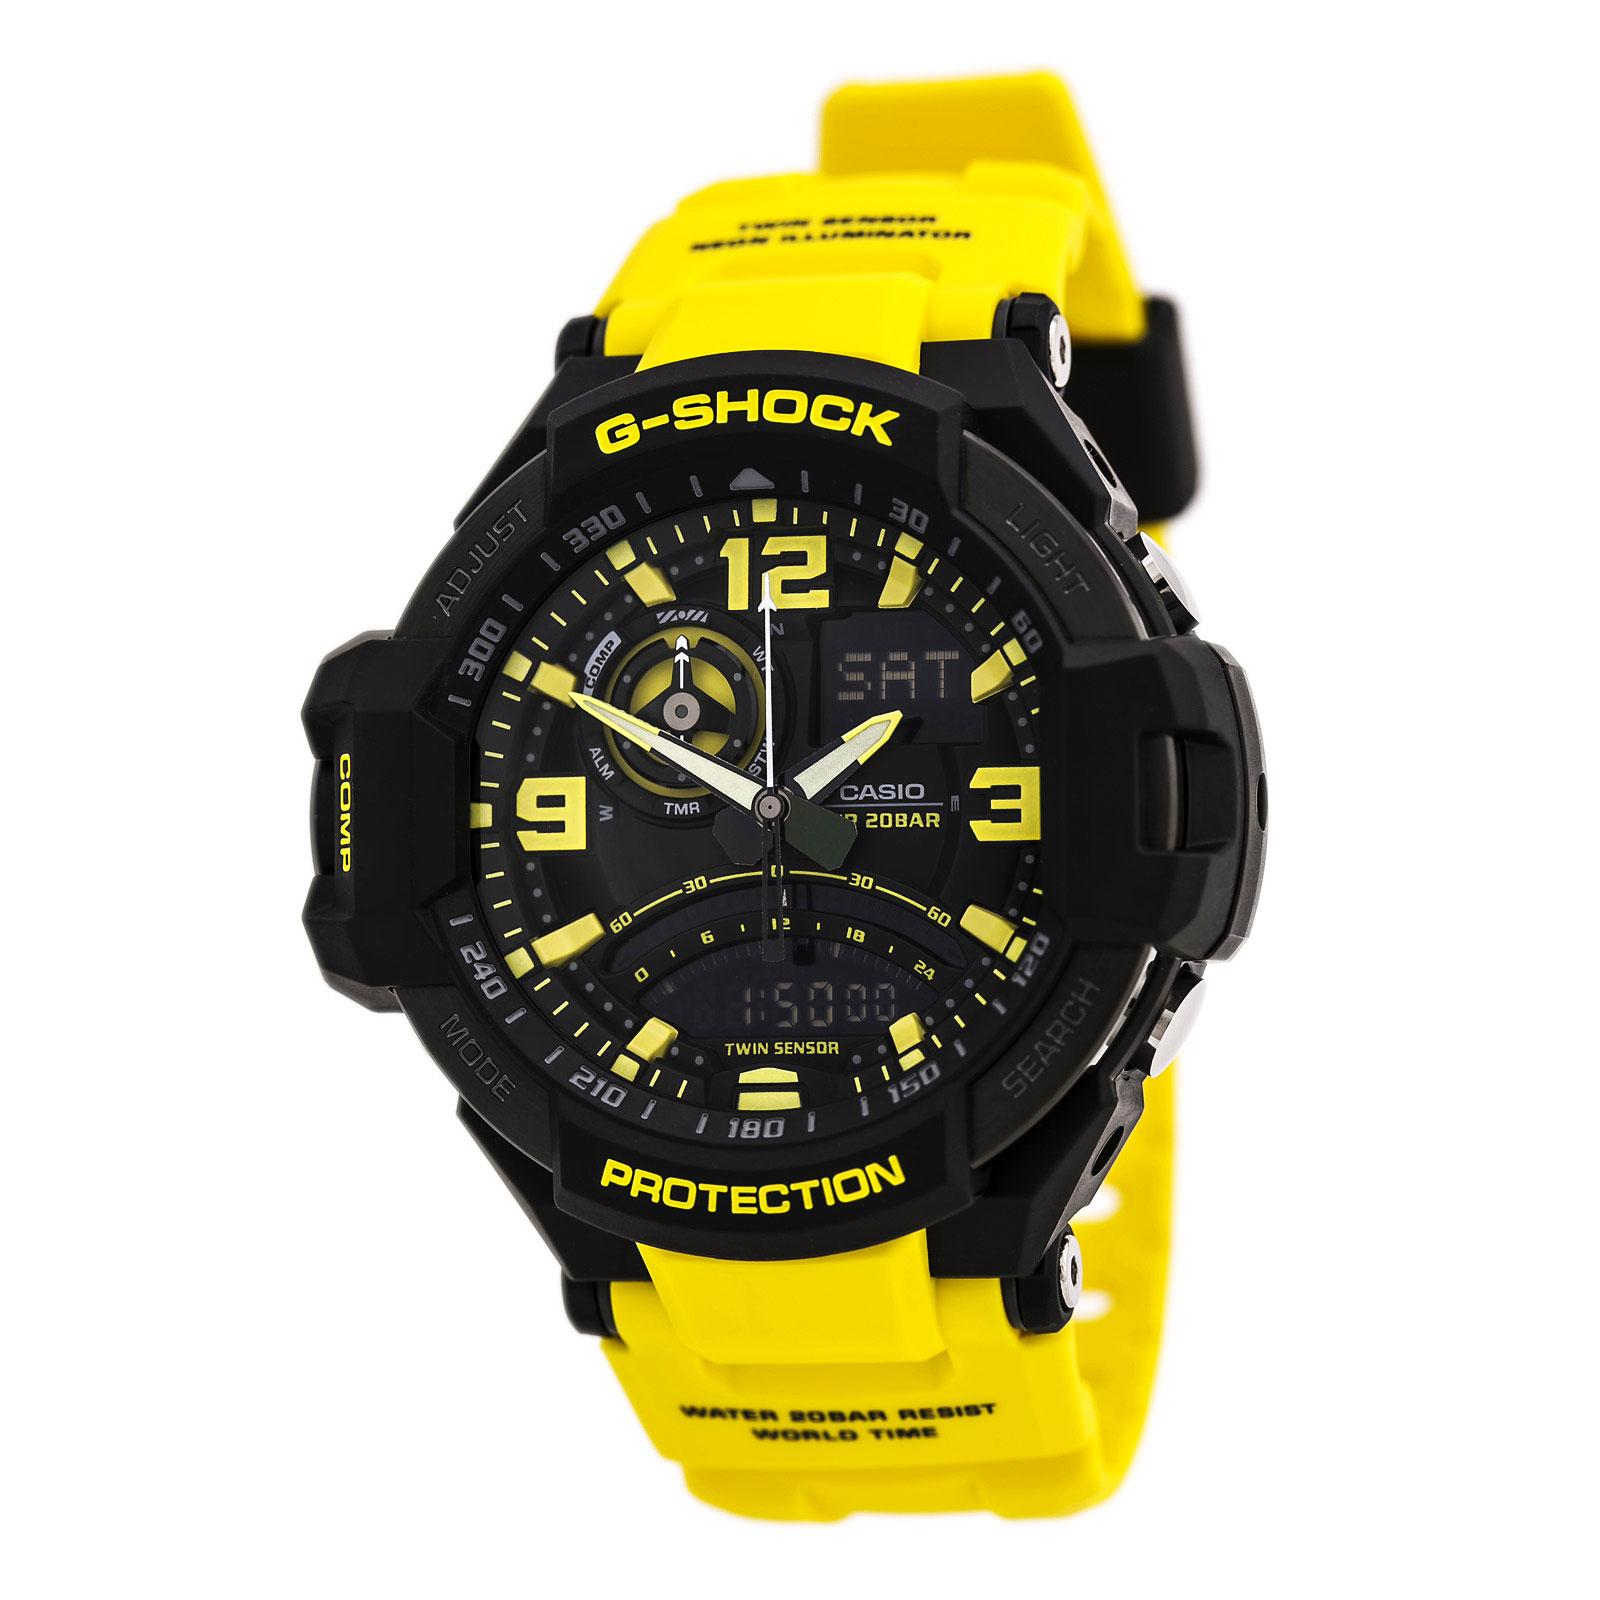 Casio Men's G-Shock GA1000-9B Yellow Resin Quartz Watch